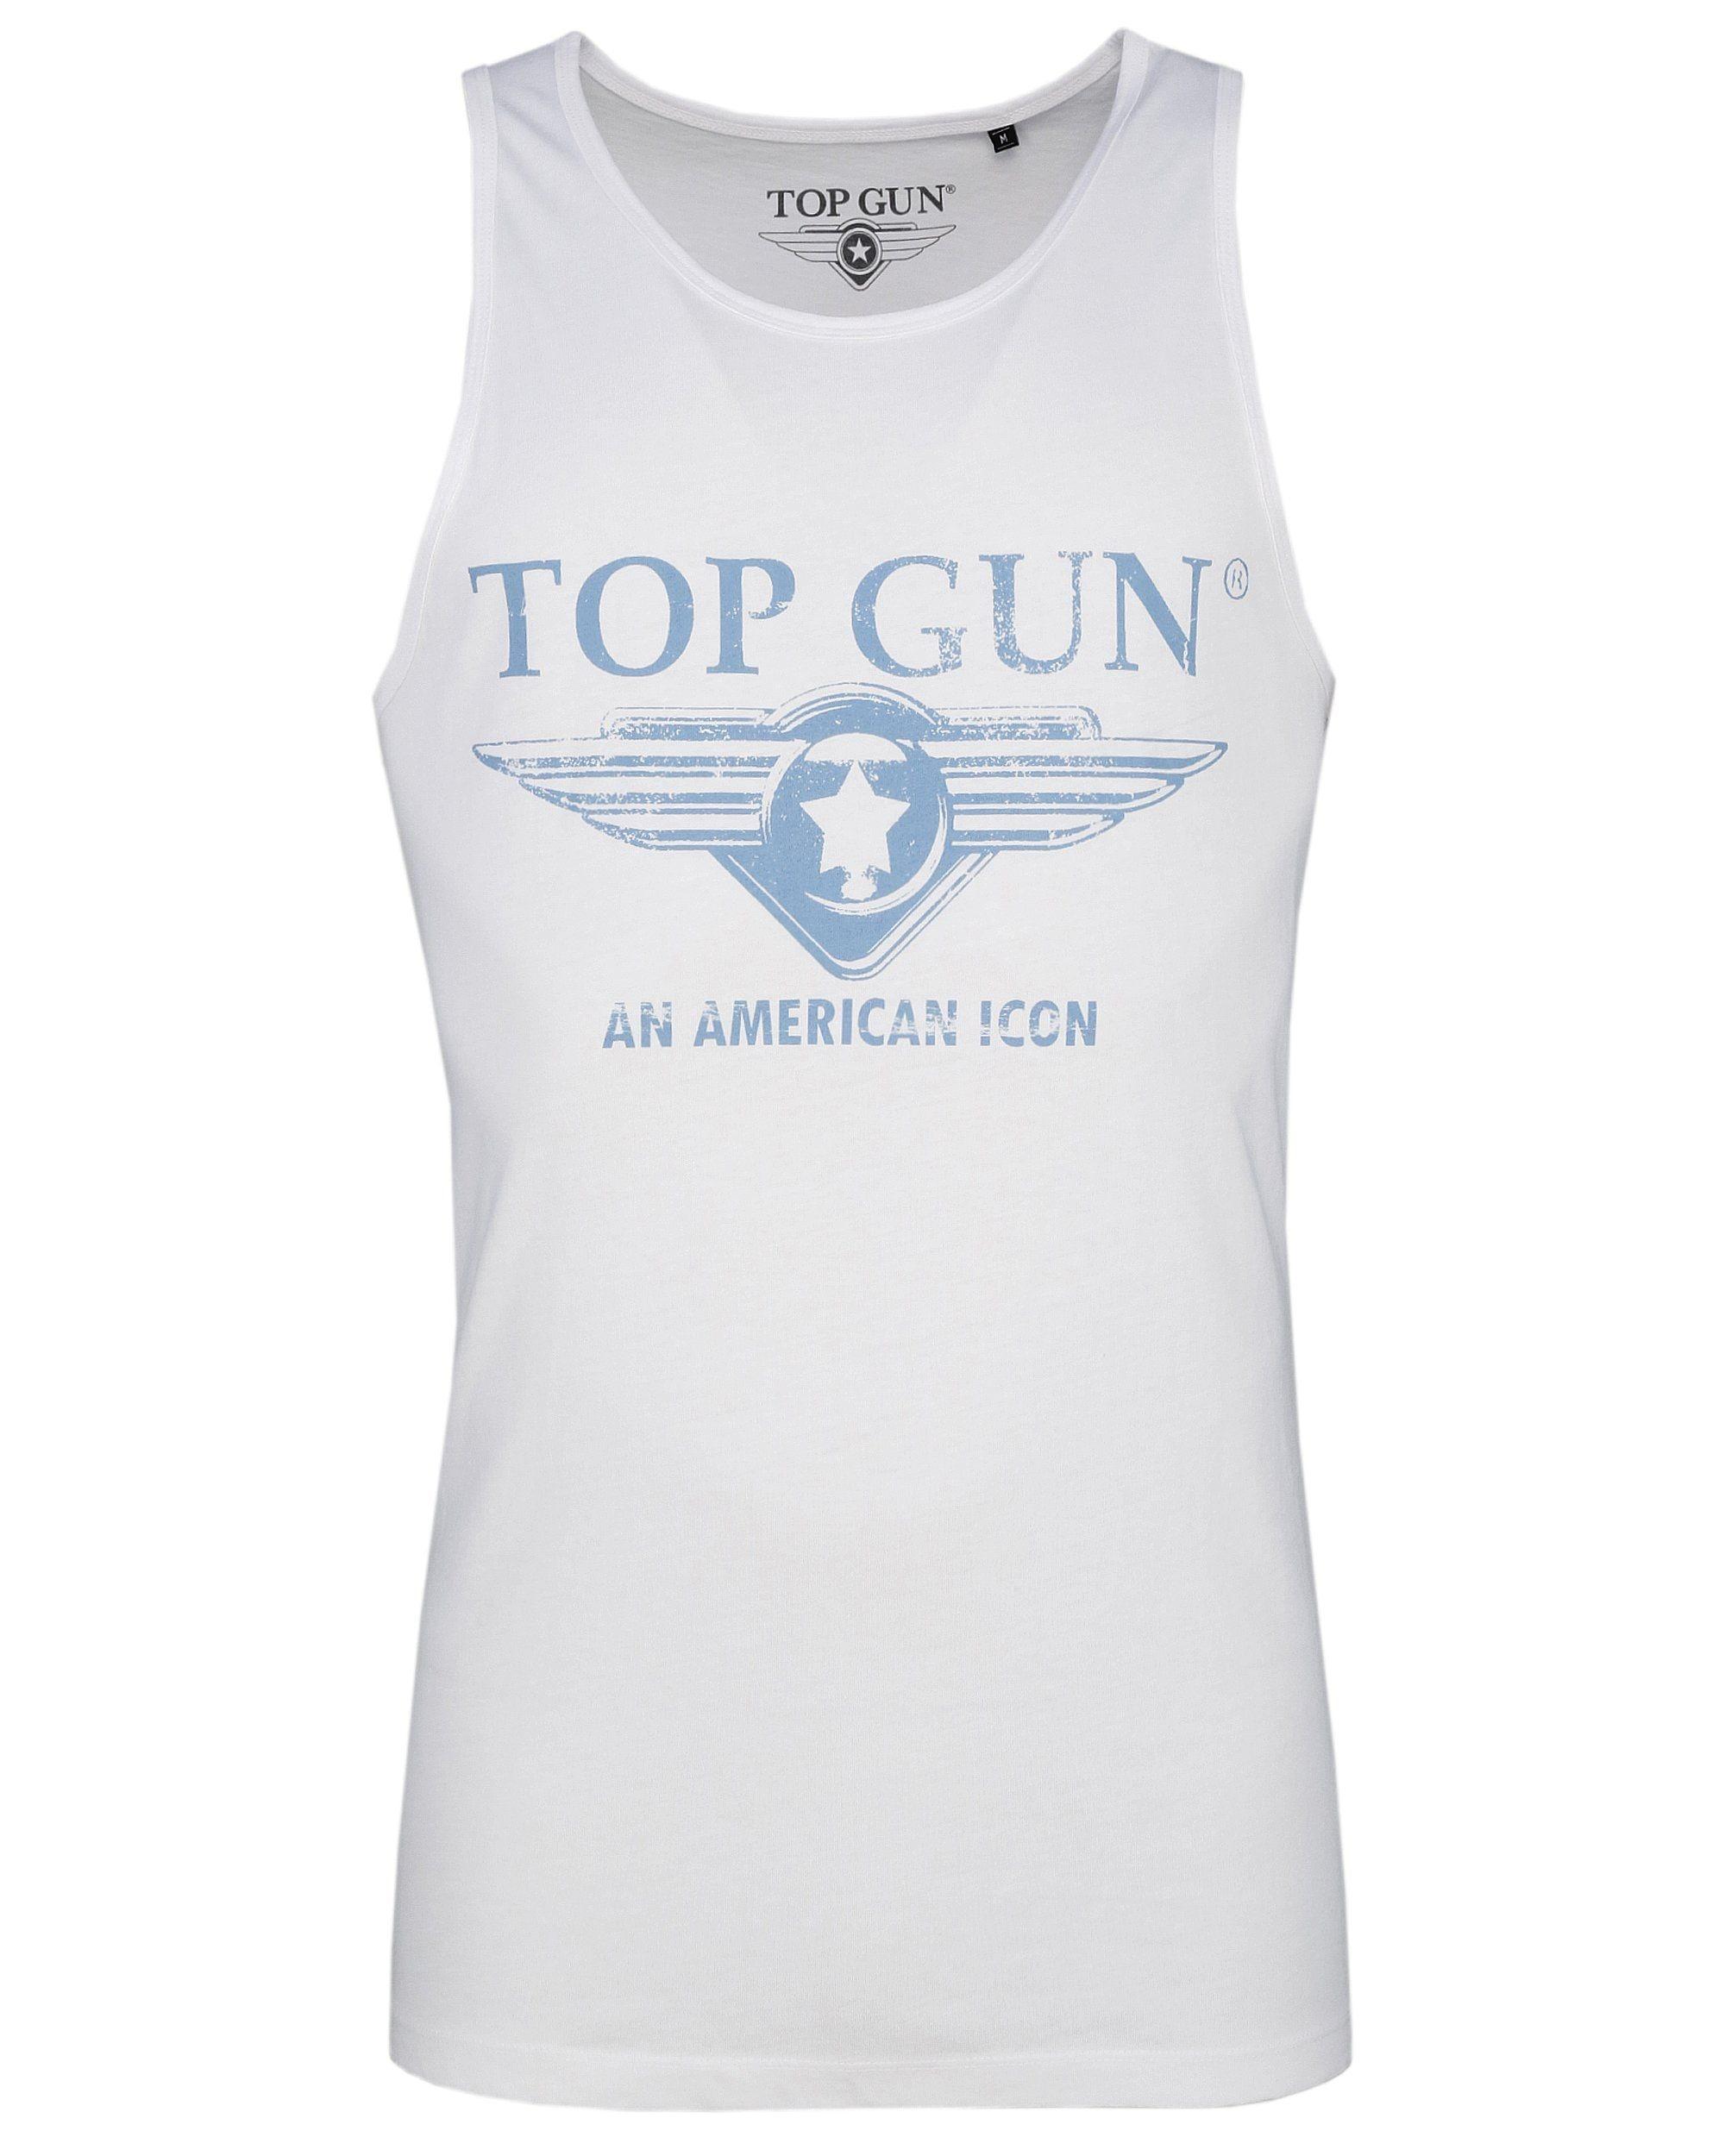 TOP GUN Muscleshirt Pray blau Herren Tank Tops Shirts